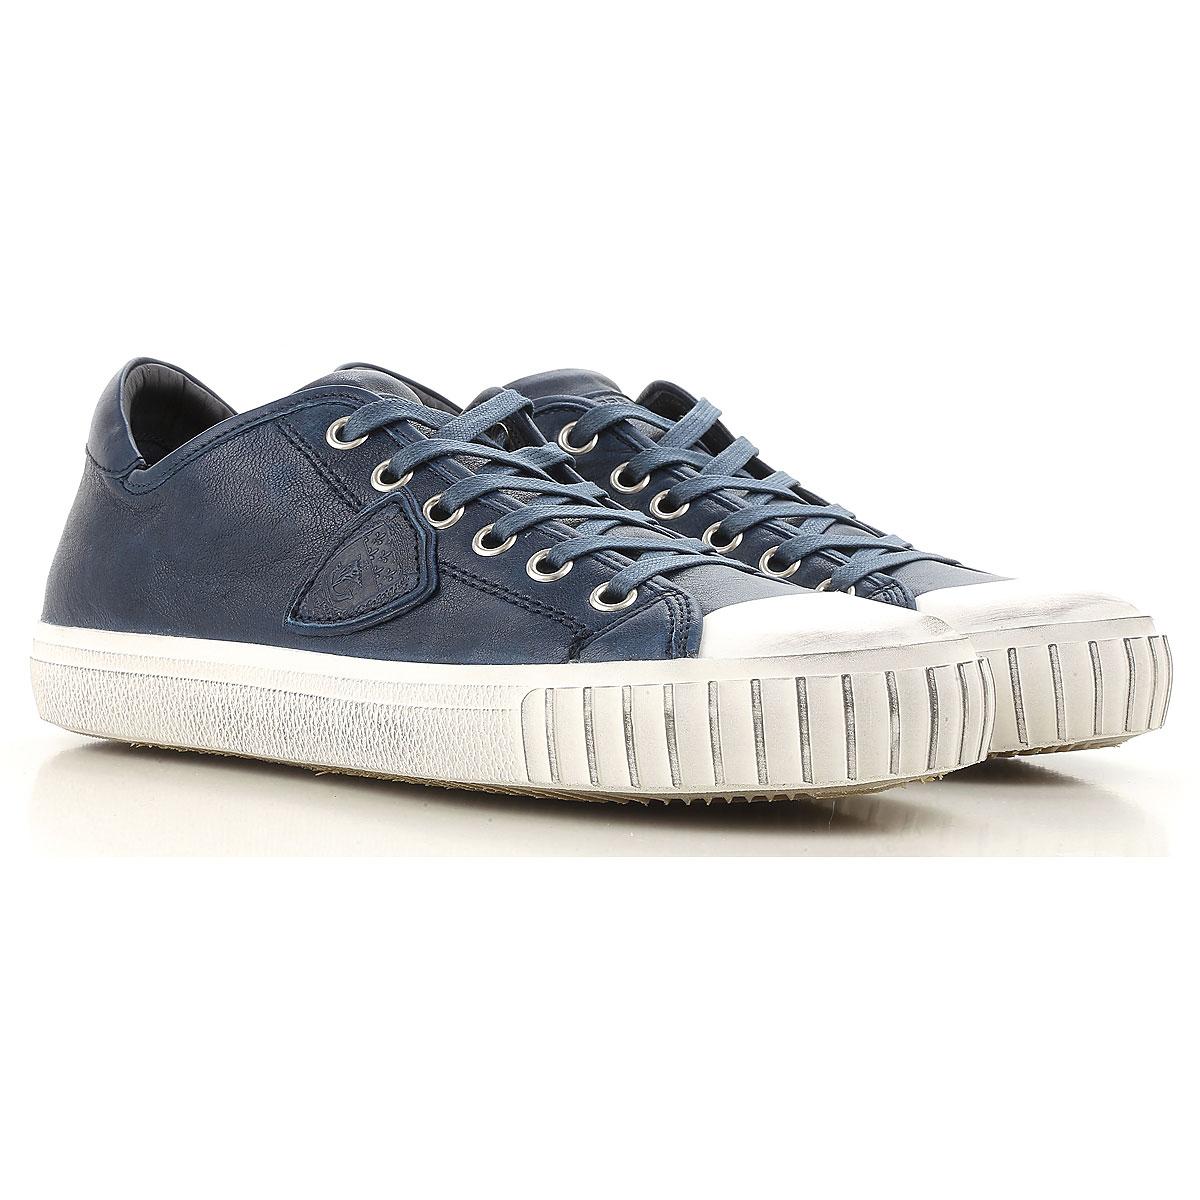 Philippe Model Sneaker für Herren, Tennisschuh, Turnschuh, Blau, Leder, 2019, 40 41 42